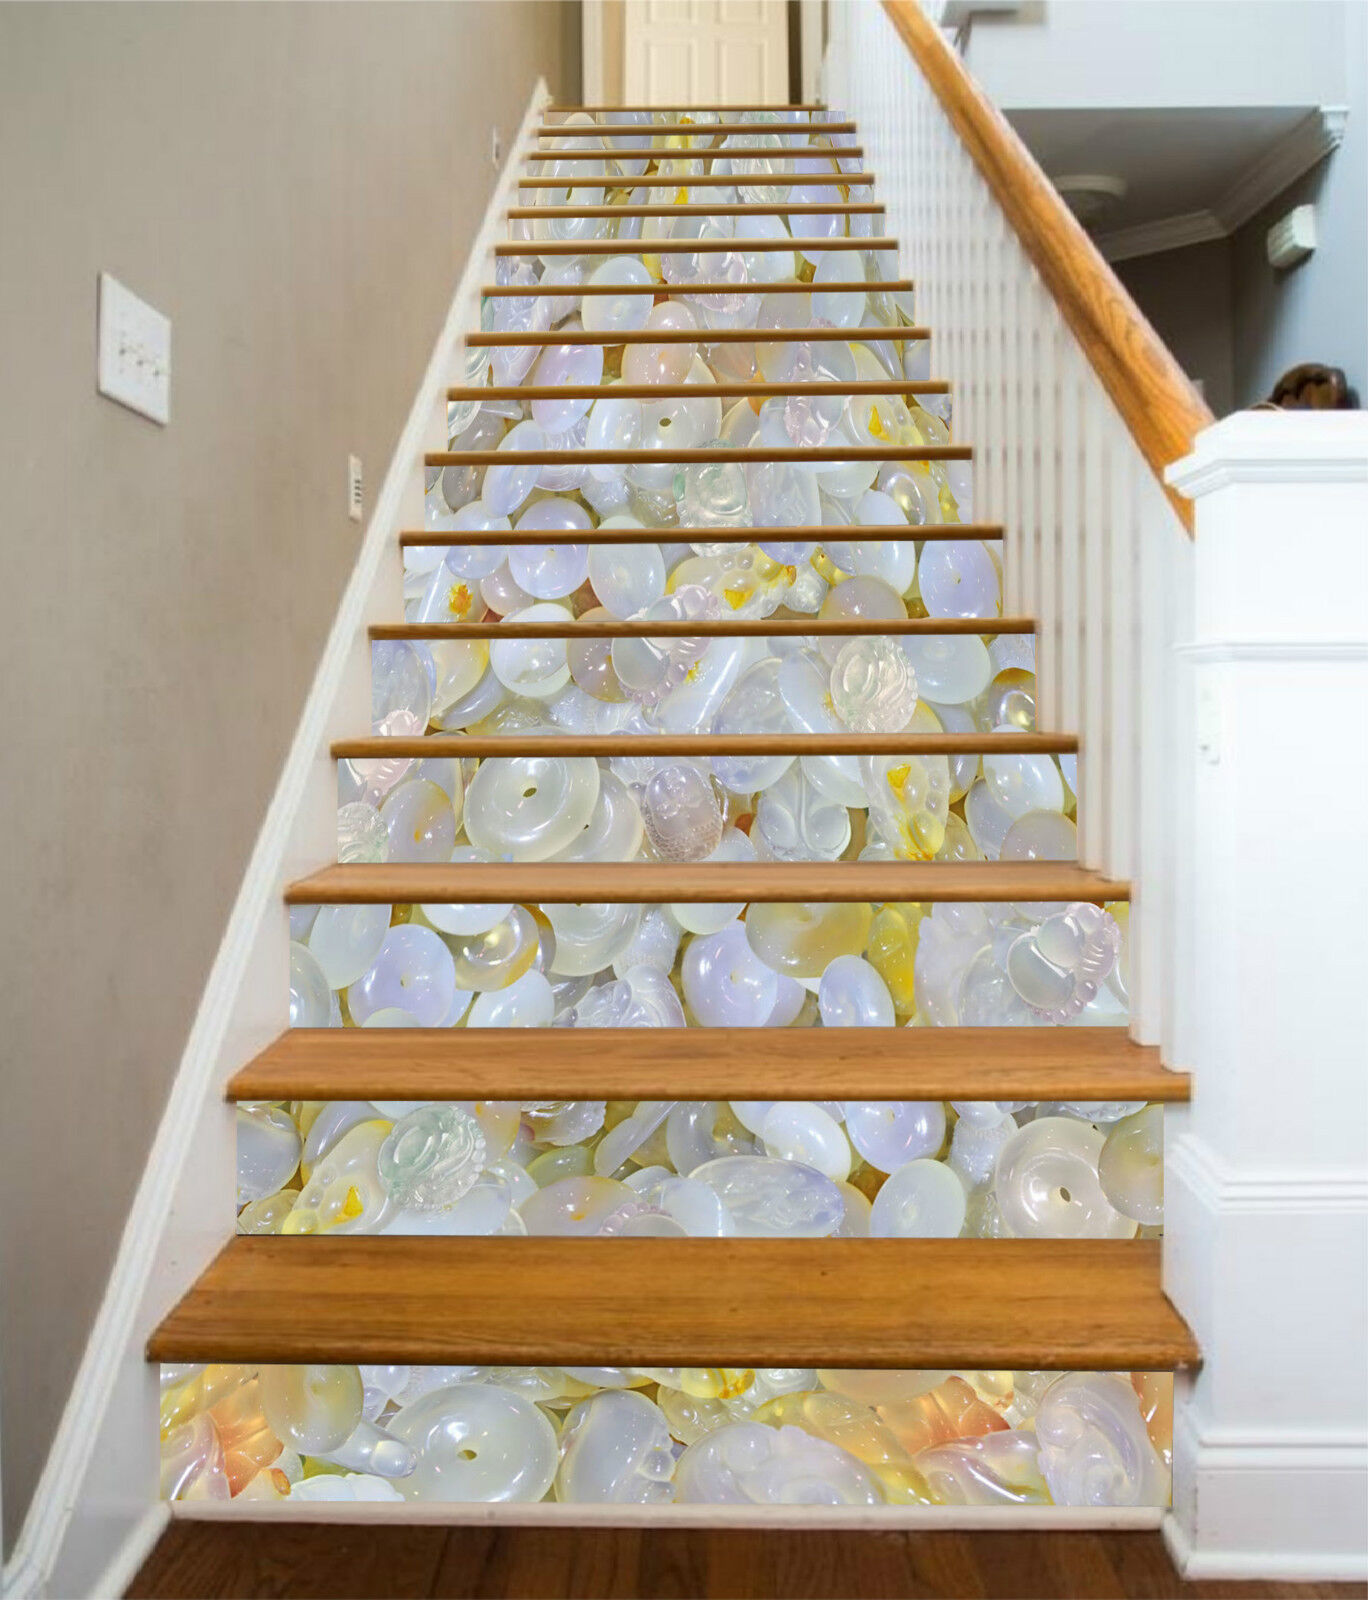 3D Jade Stein 573 Stair Risers Dekoration Fototapete Vinyl Aufkleber Tapete DE